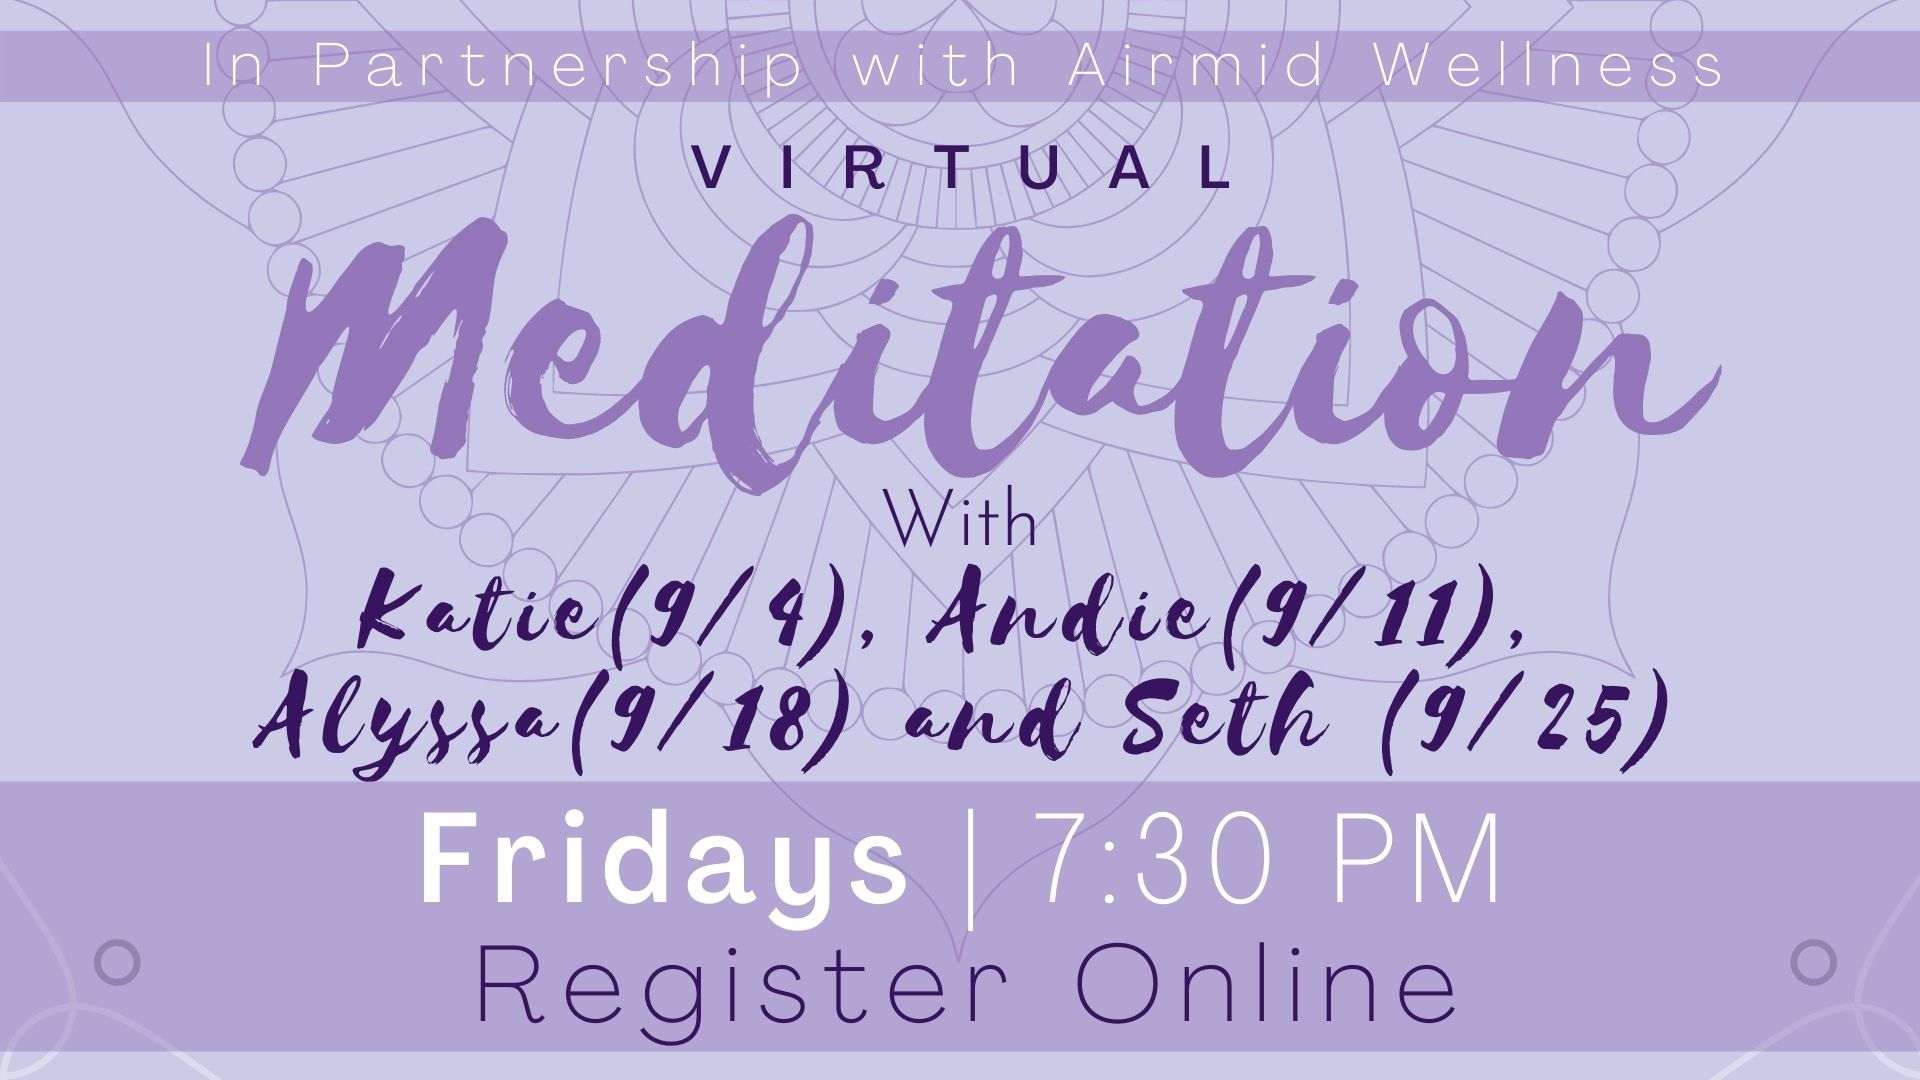 (Virtual) Meditation Class